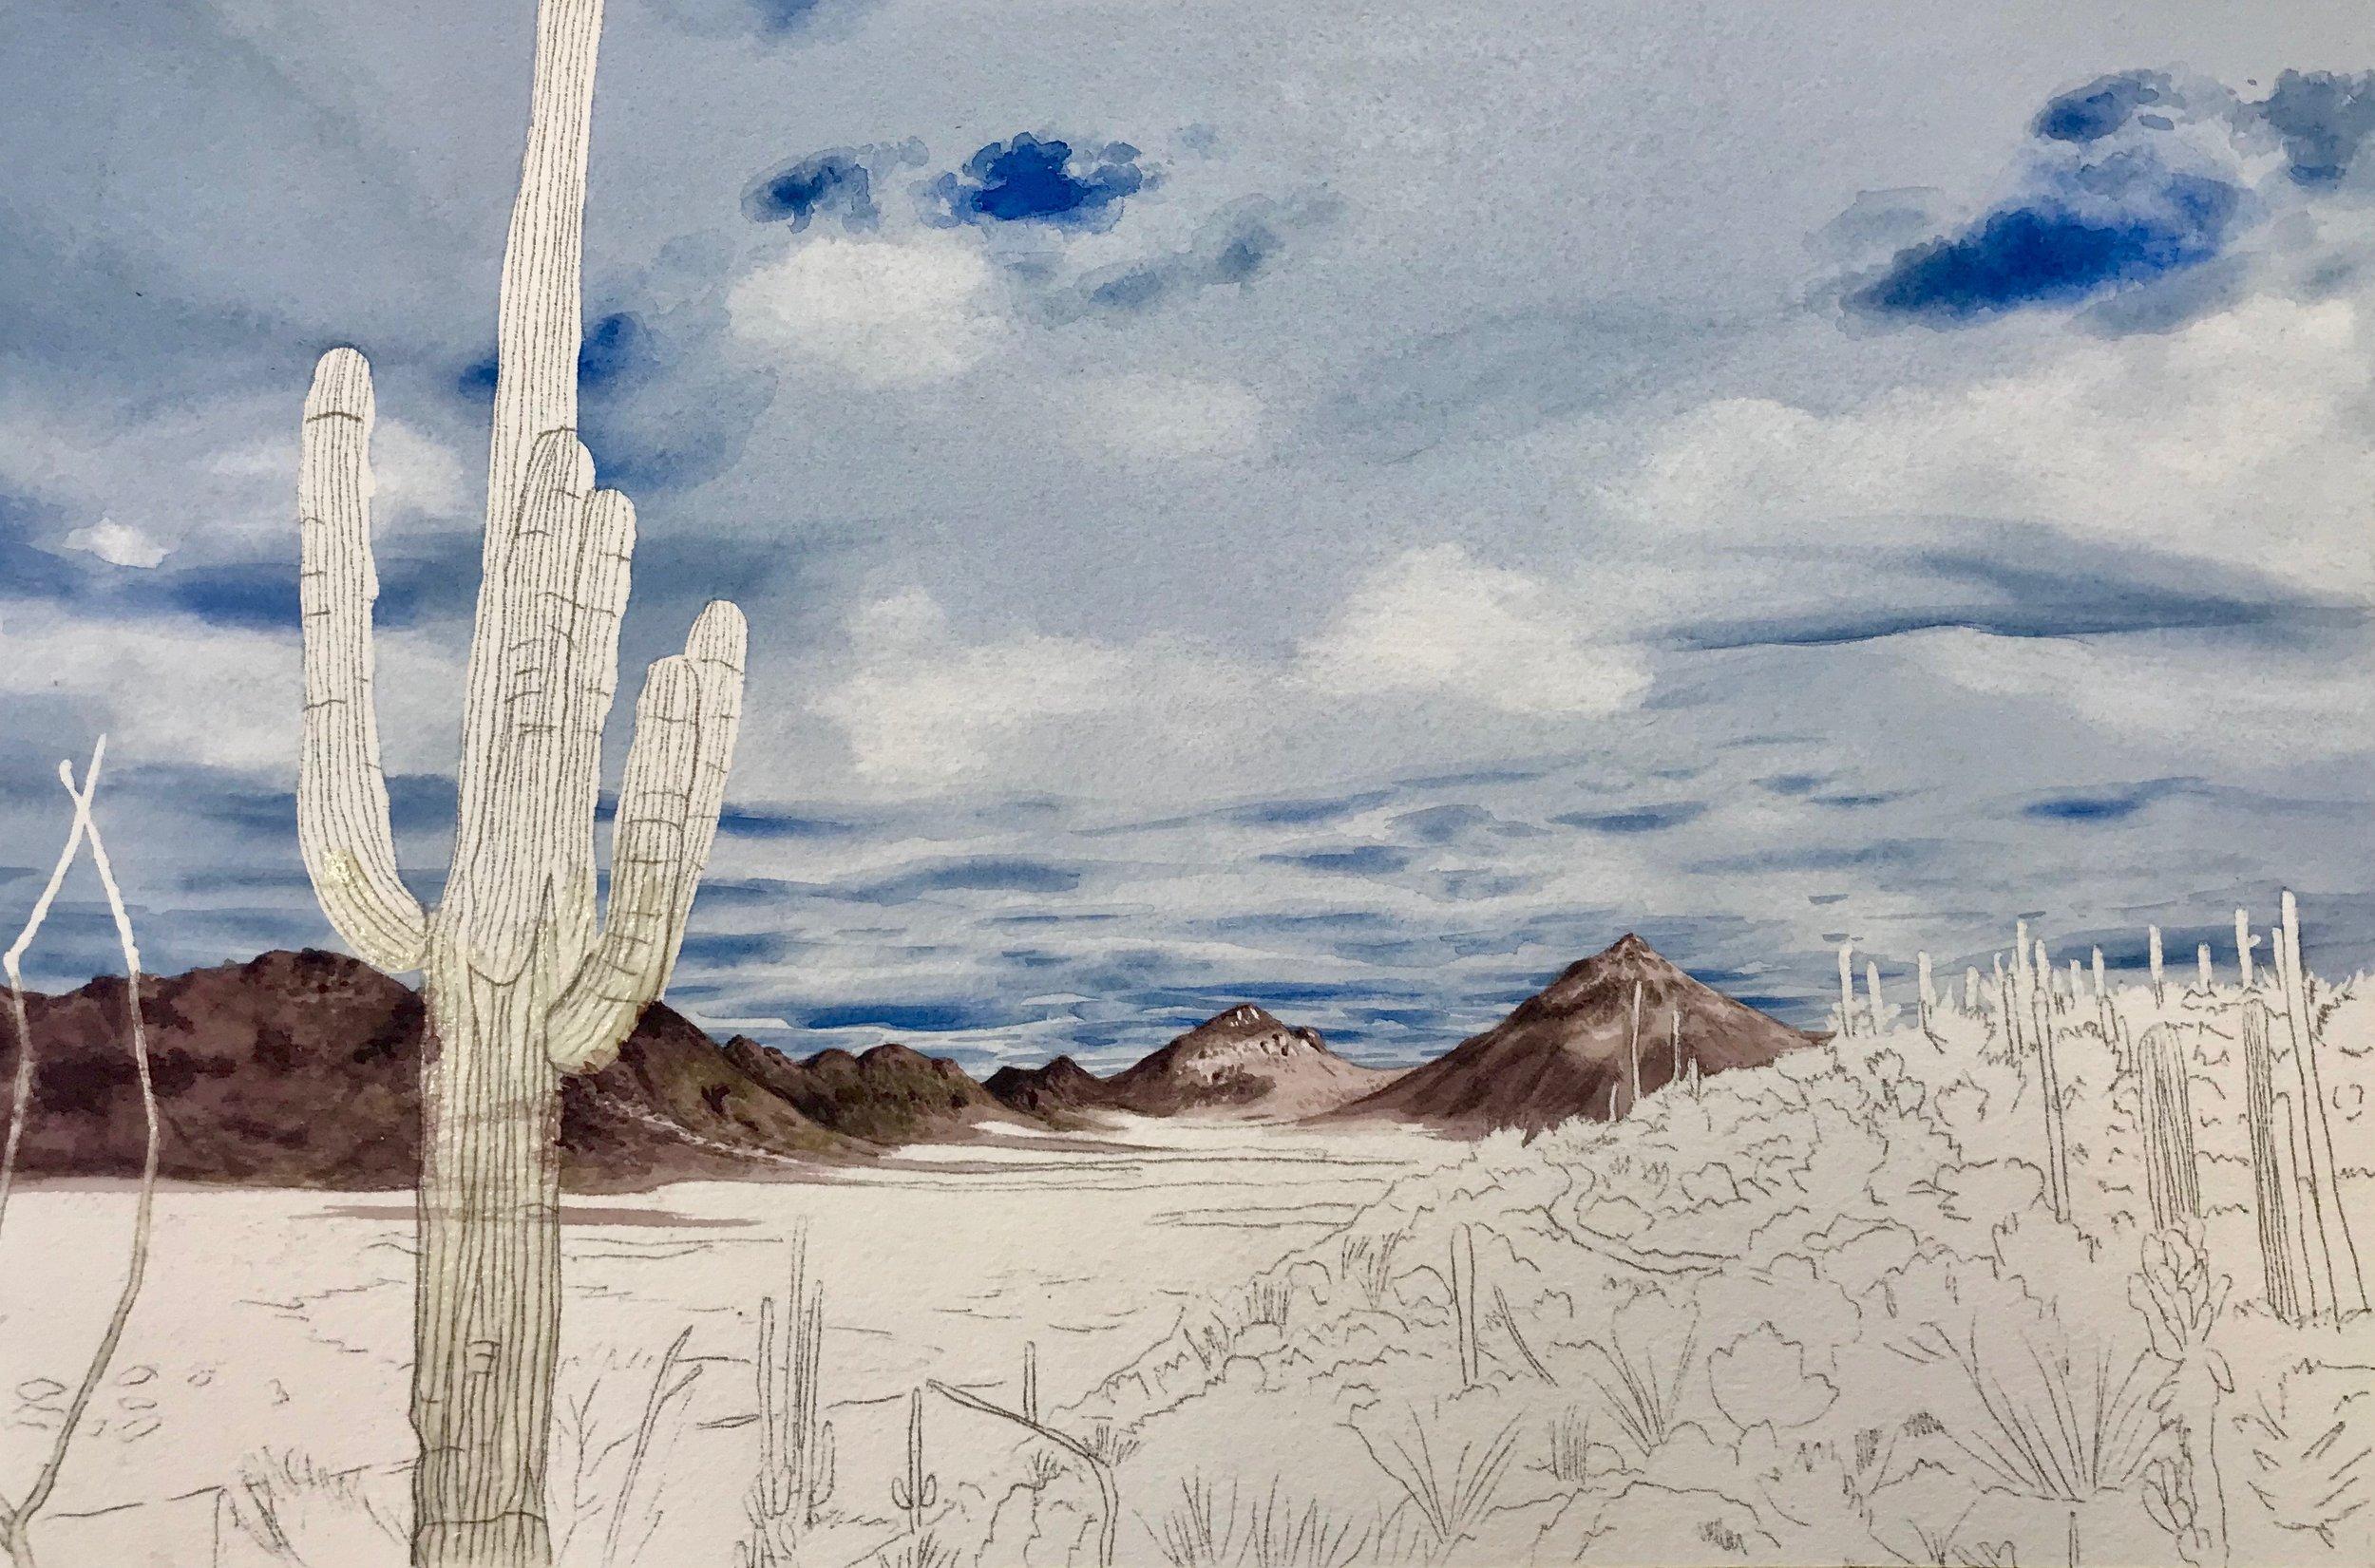 Work in progress from my watercolor class